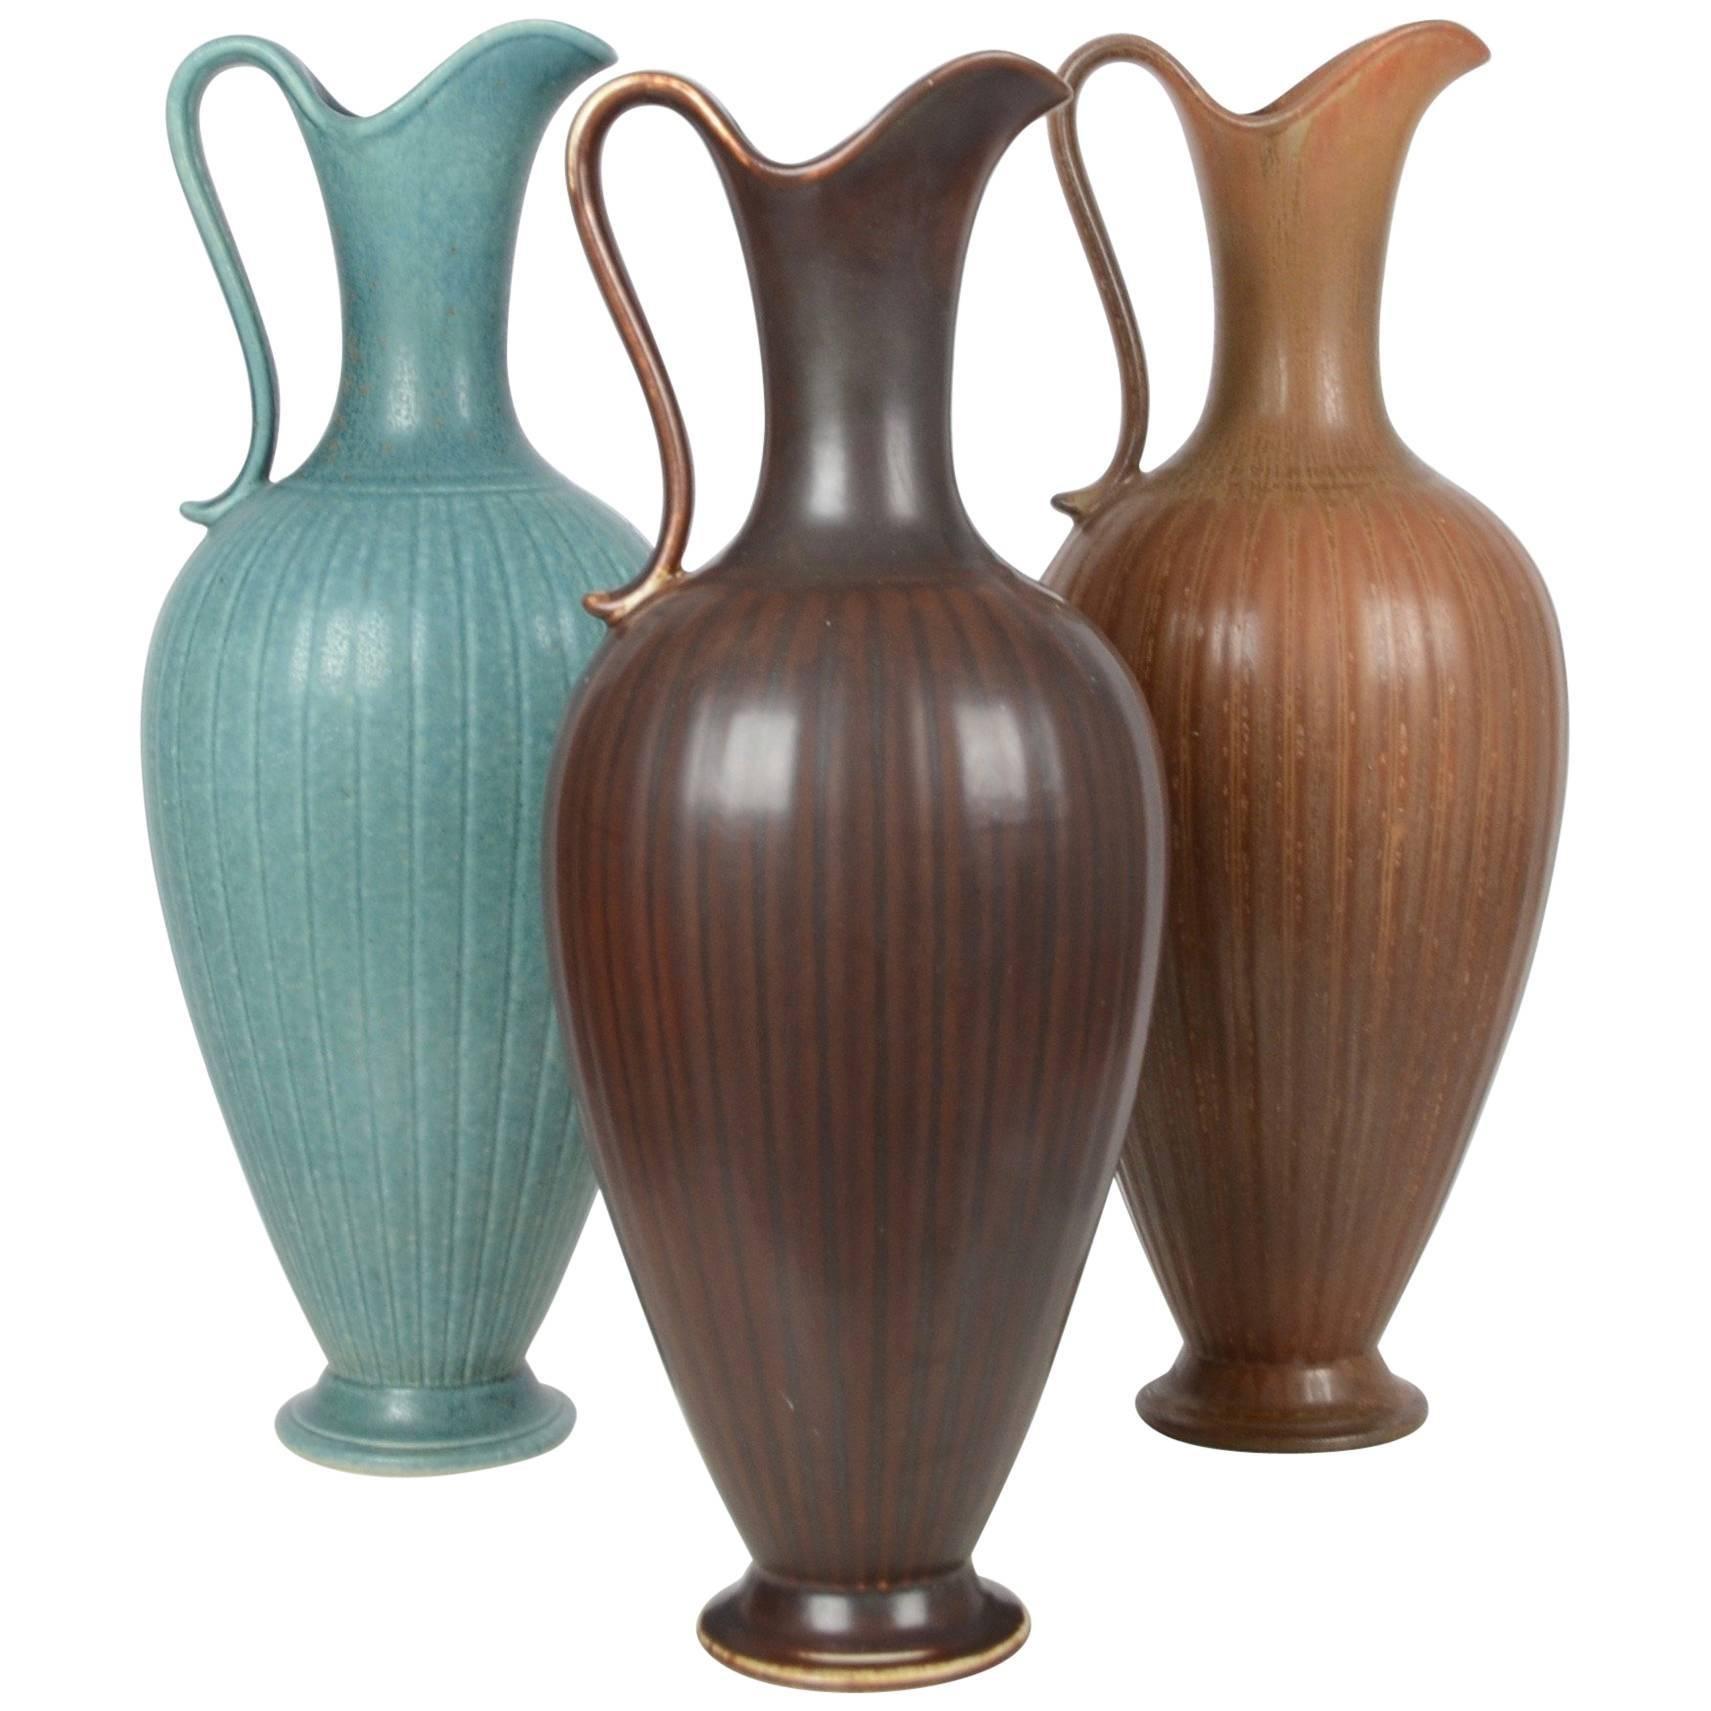 Gunnar Nylund, Set with Three Vases / Pitchers, Ceramic, Rörstrand, Sweden